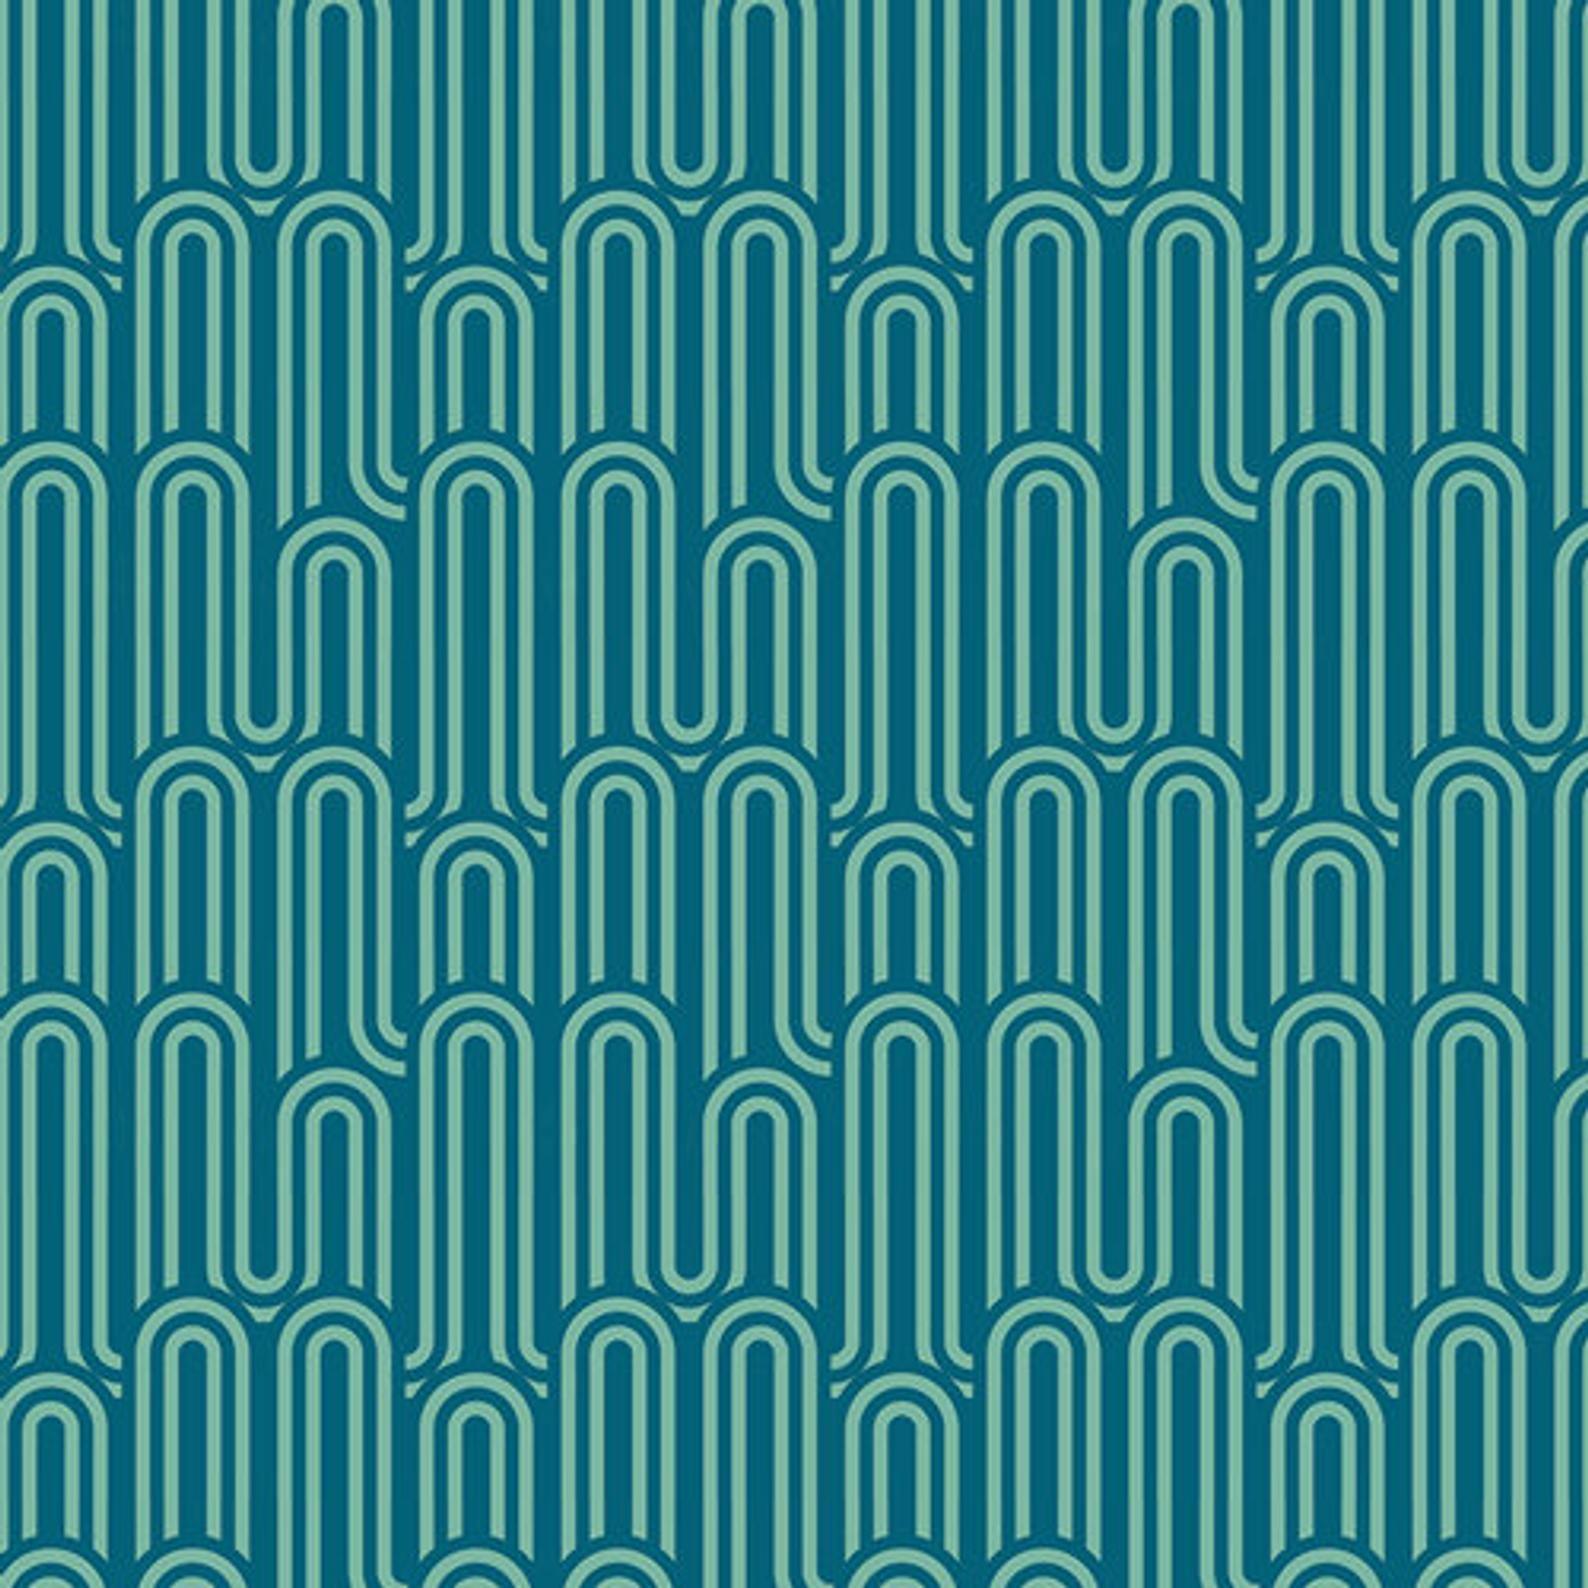 Fabric Lucid Hills Jade Voile Art Gallery